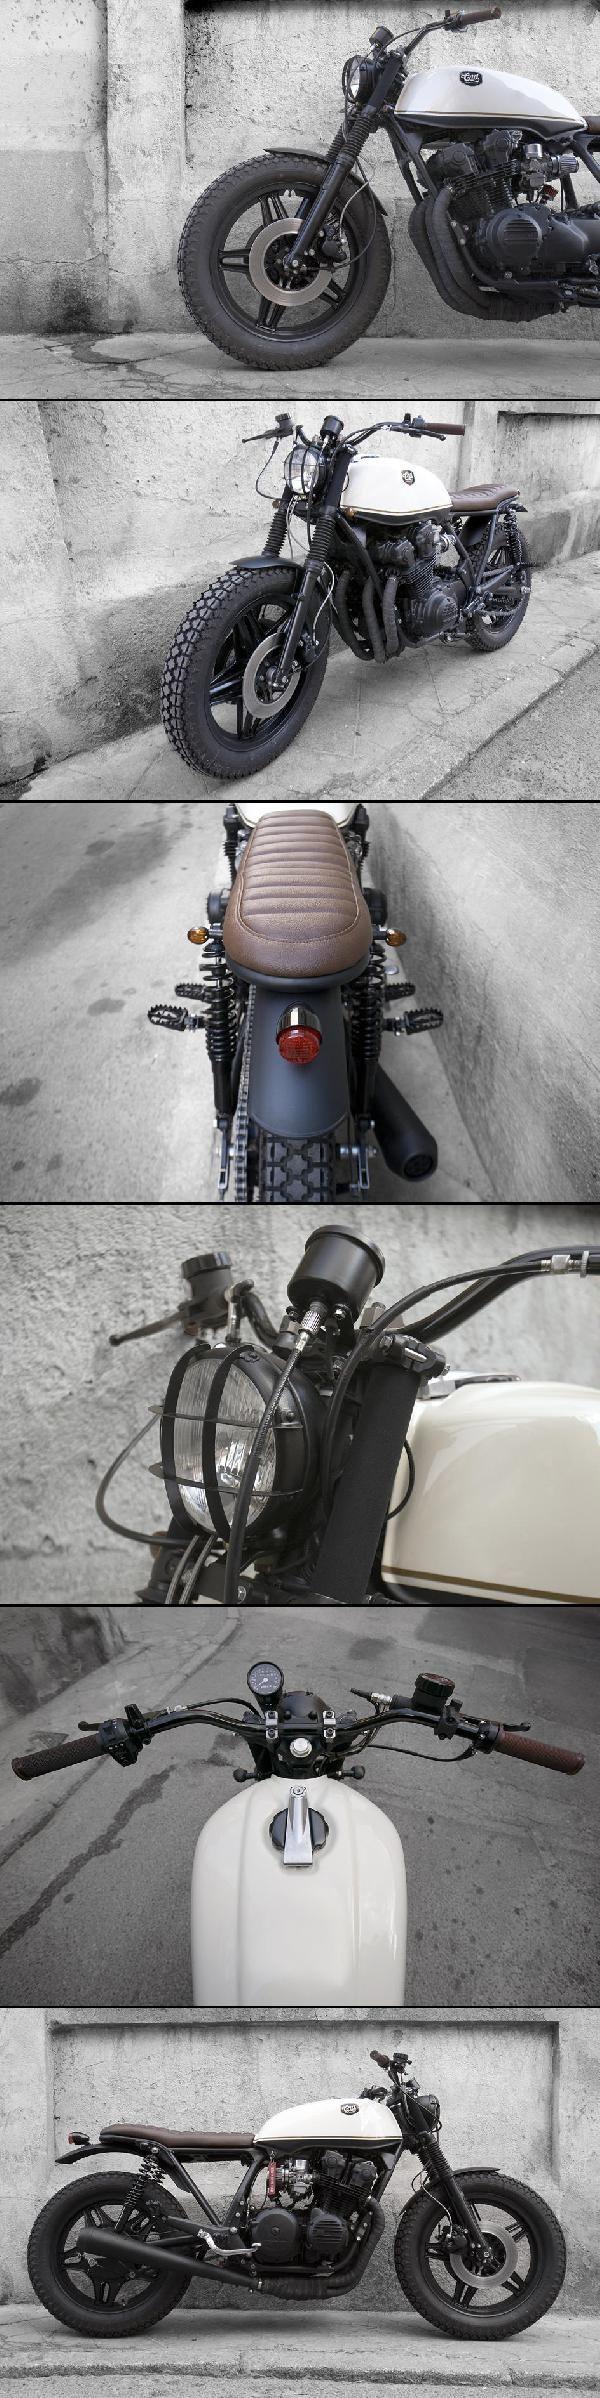 CRD | Honda CB 750 KZ | CRD#11 - Black Cream >> http://www.caferacerdreams.com.es/motos/encargos-de-otros-clientes/honda-cb-750-kz-crd-11-black-cream